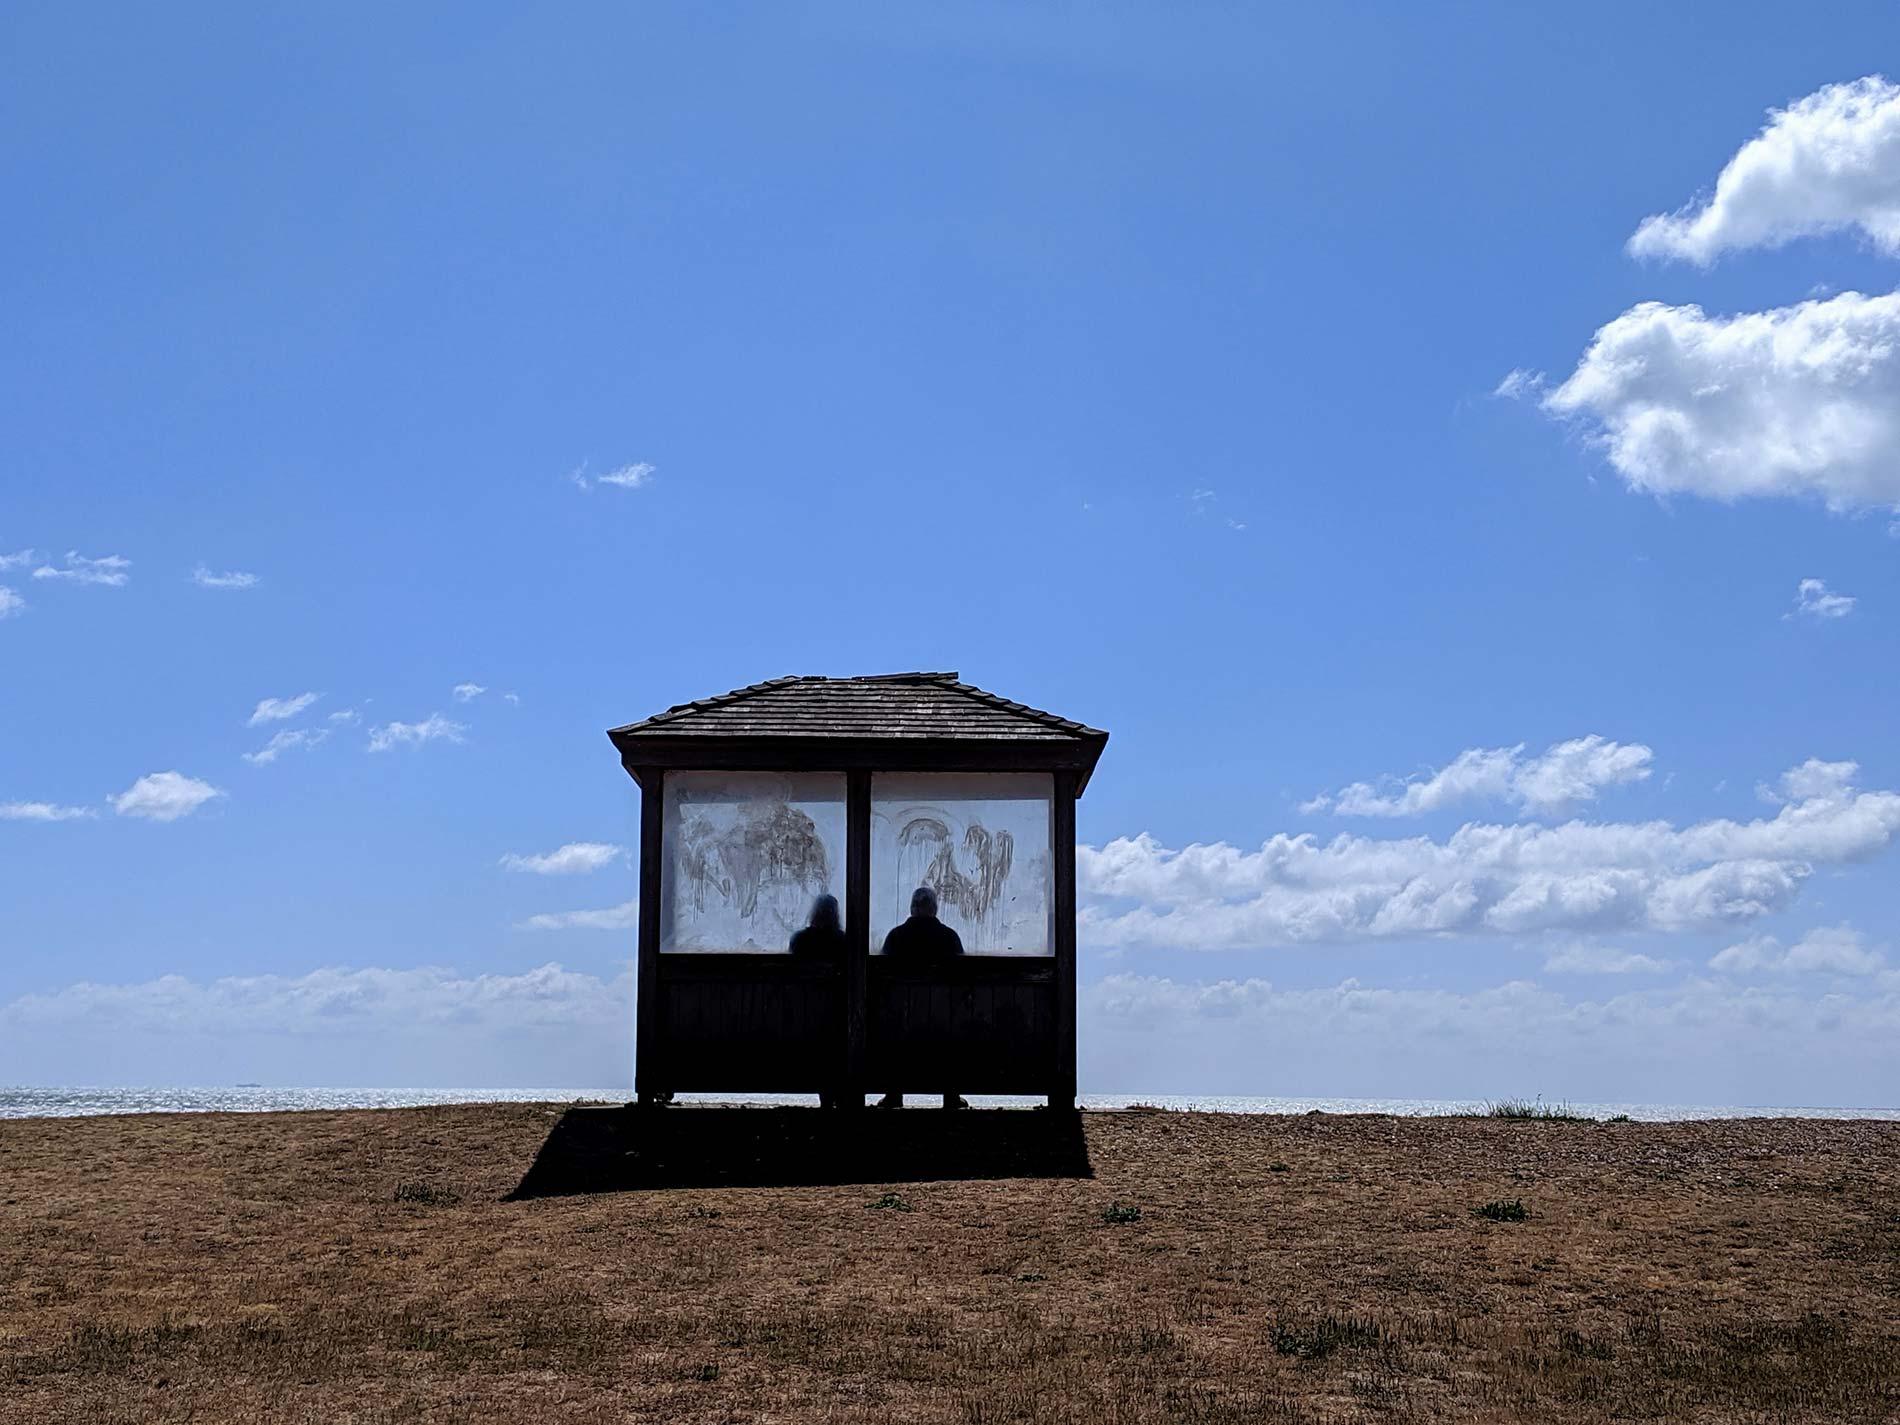 Frank Francis : Shelter